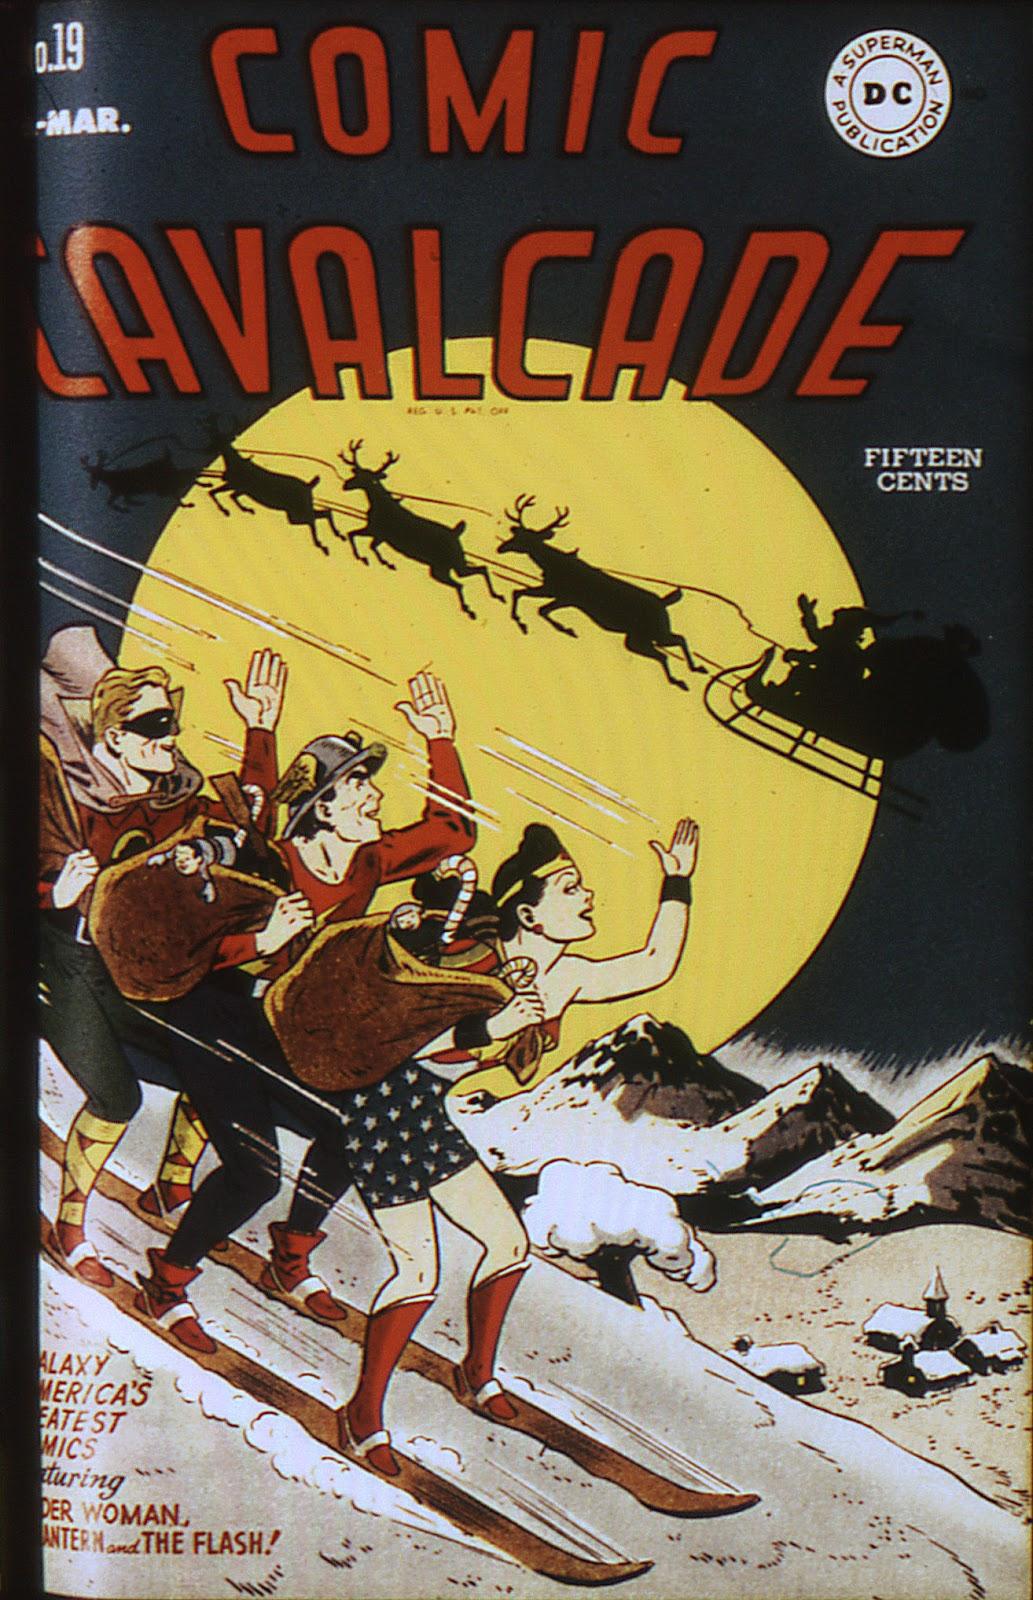 Comic Cavalcade issue 19 - Page 1